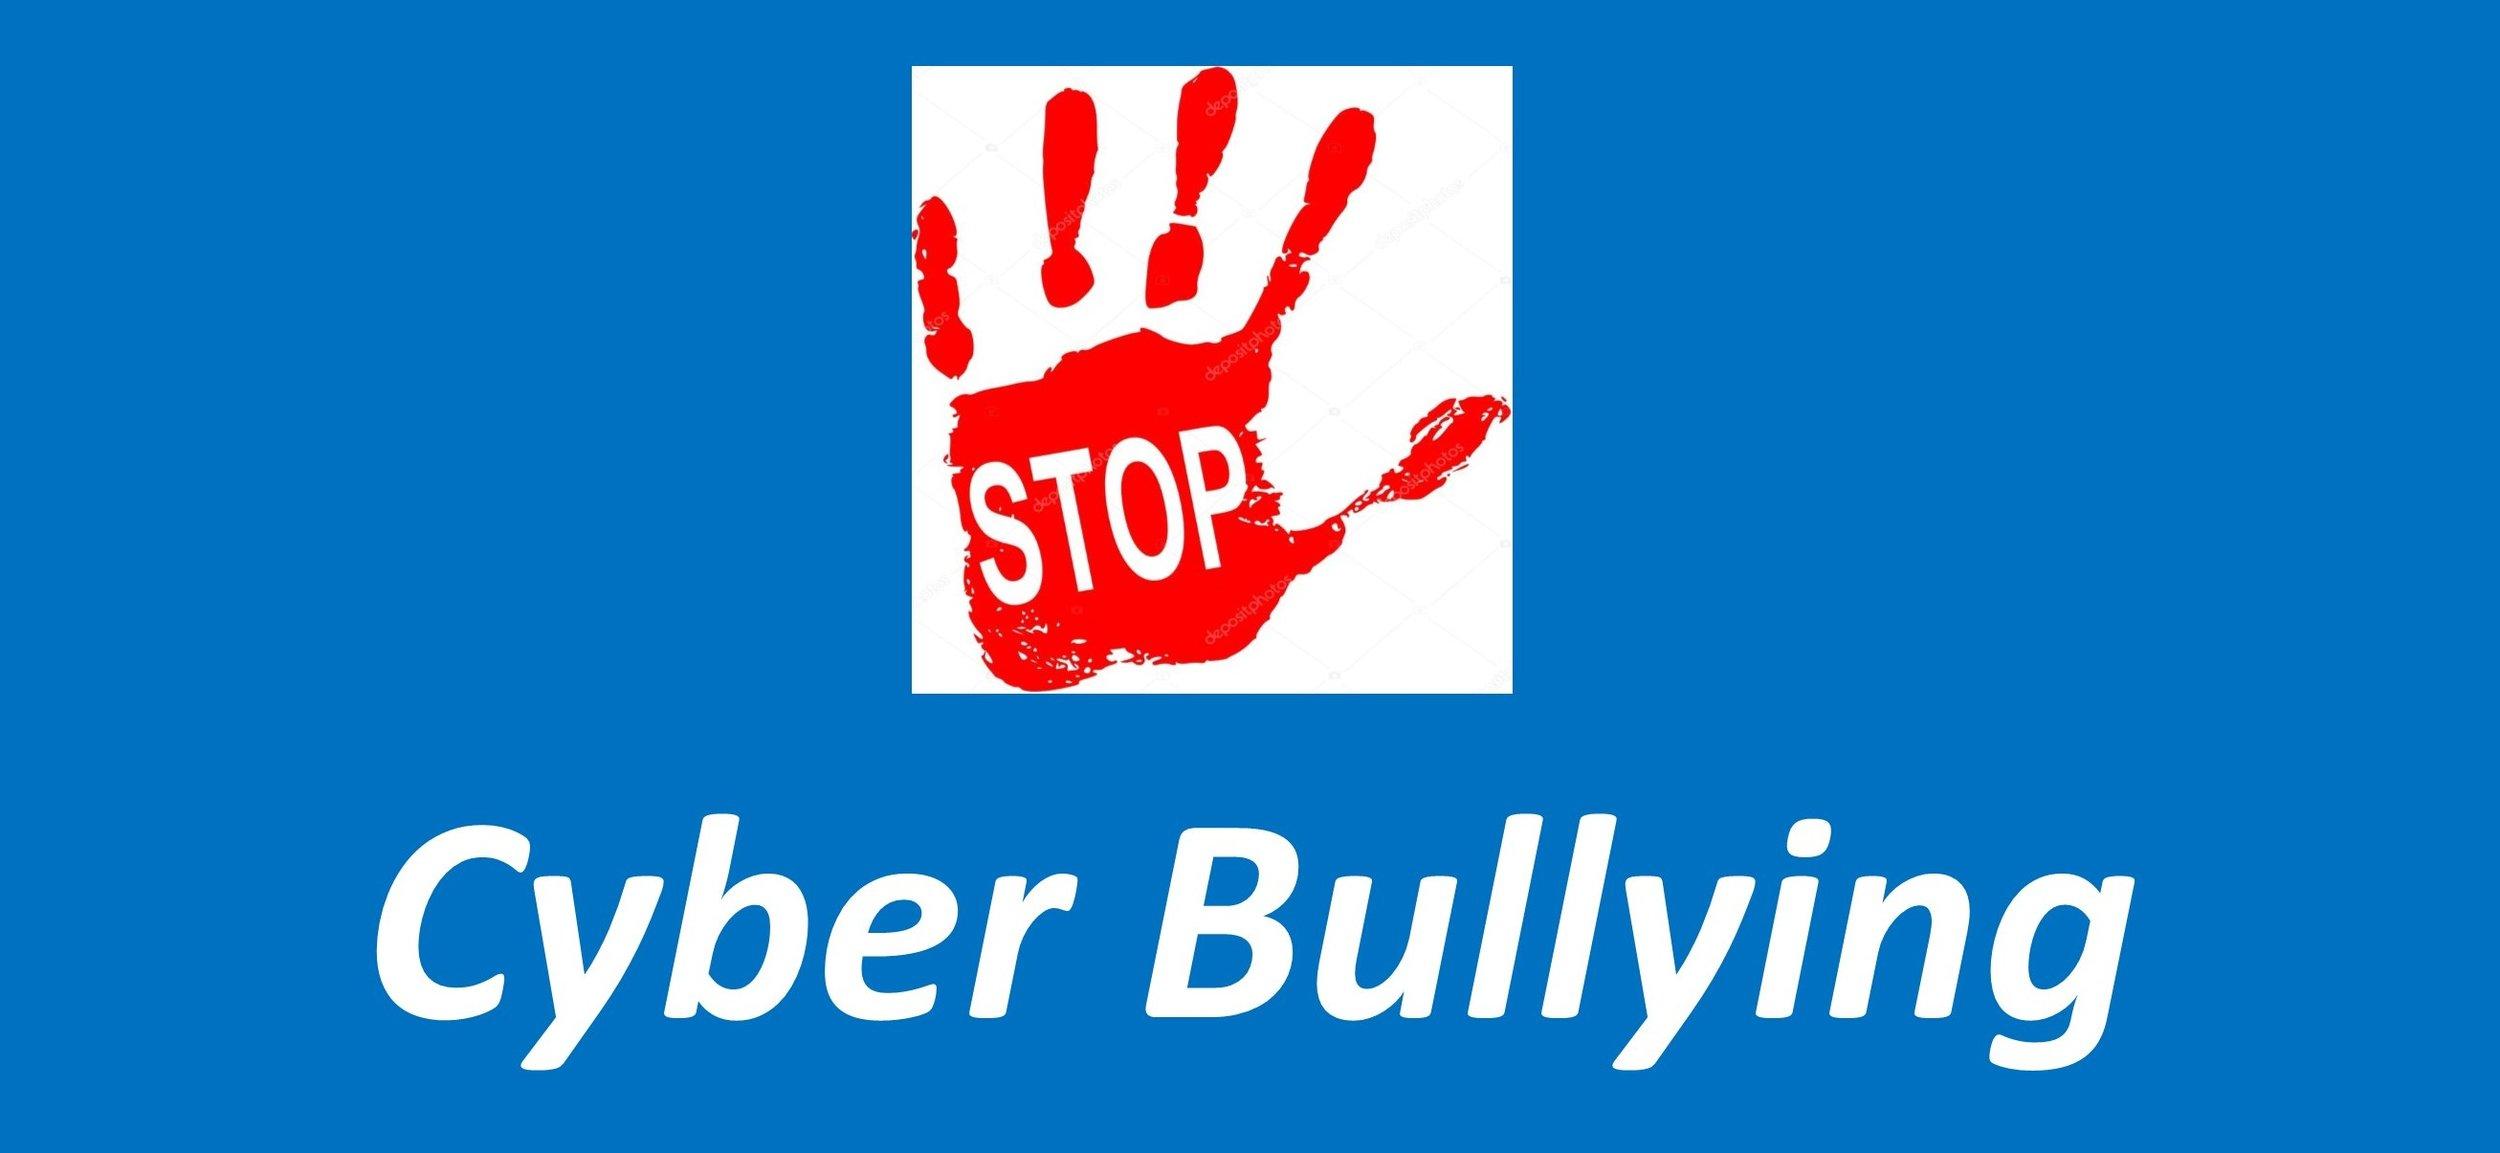 ChildSafeNet Placard - Stop Cyber Bullying.jpg